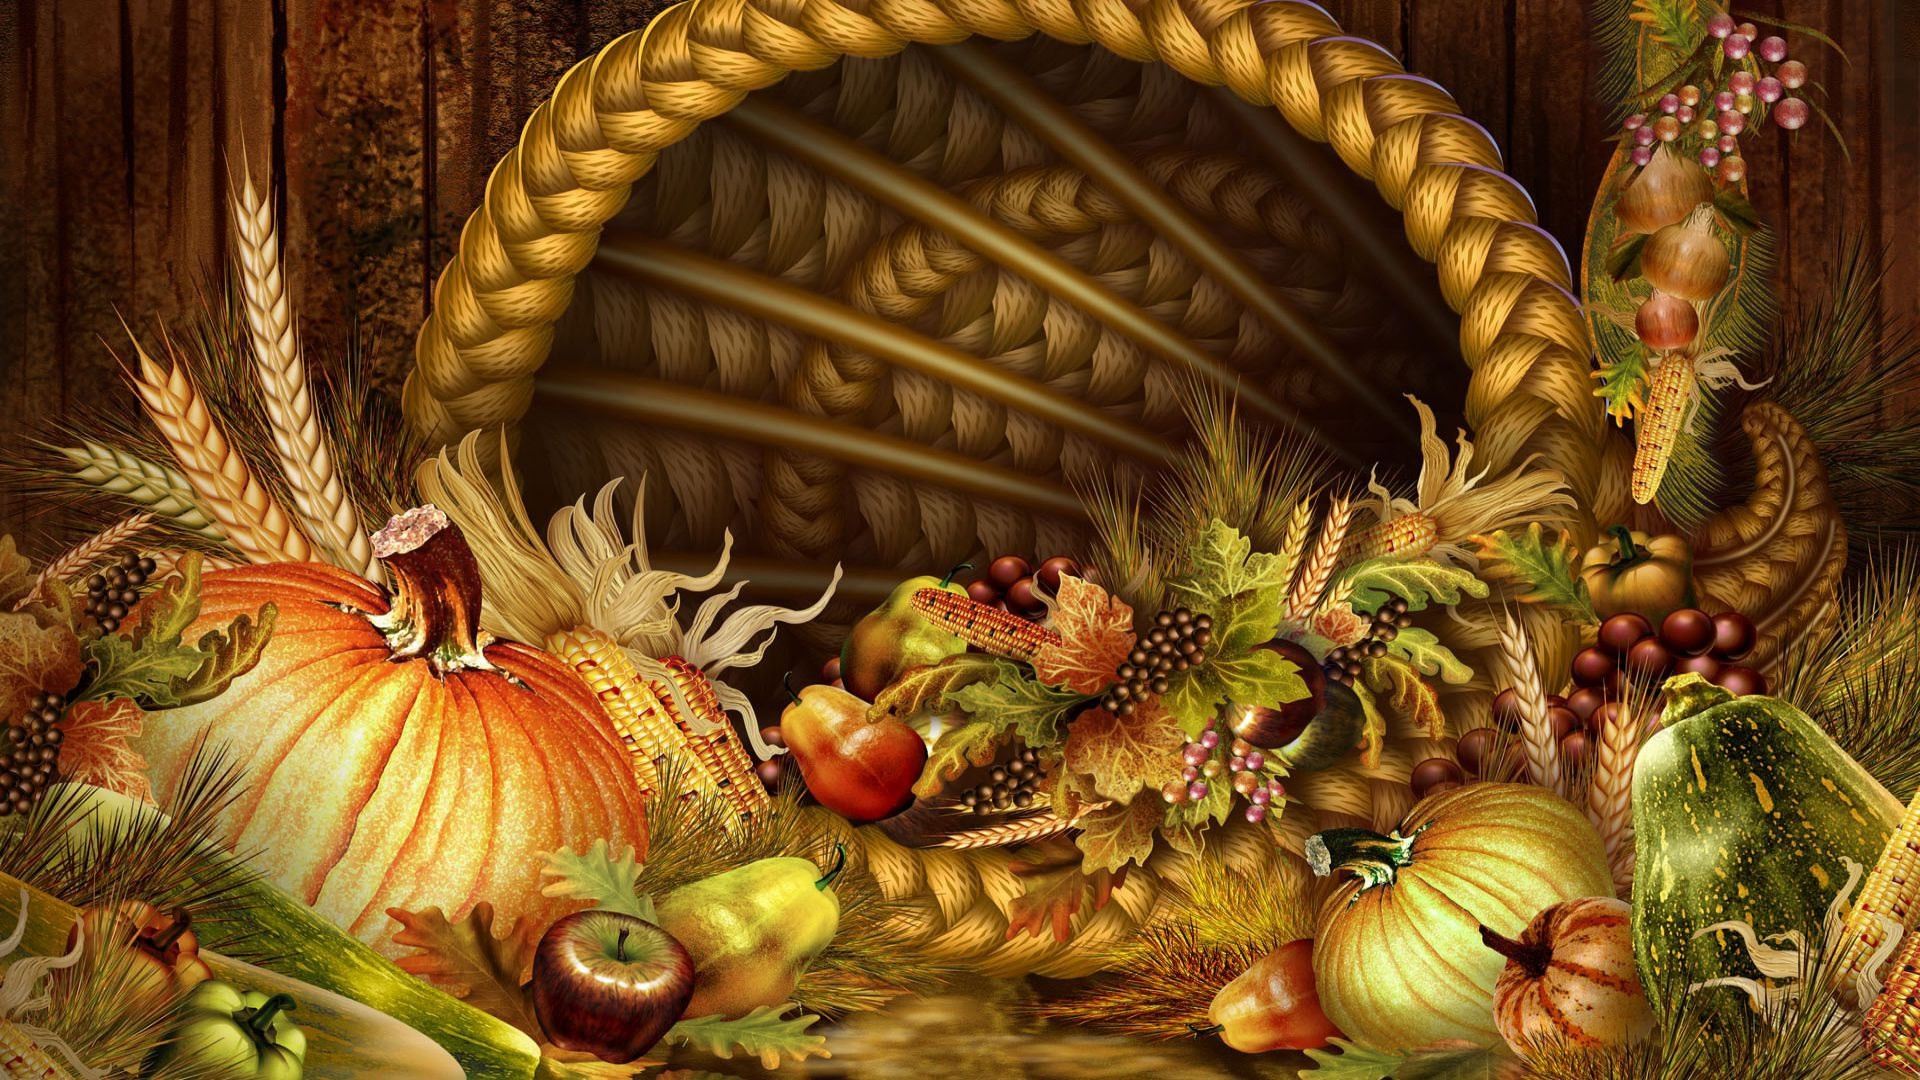 Desktop thanksgiving wallpaper 67 images - Wallpaper desktop thanksgiving ...